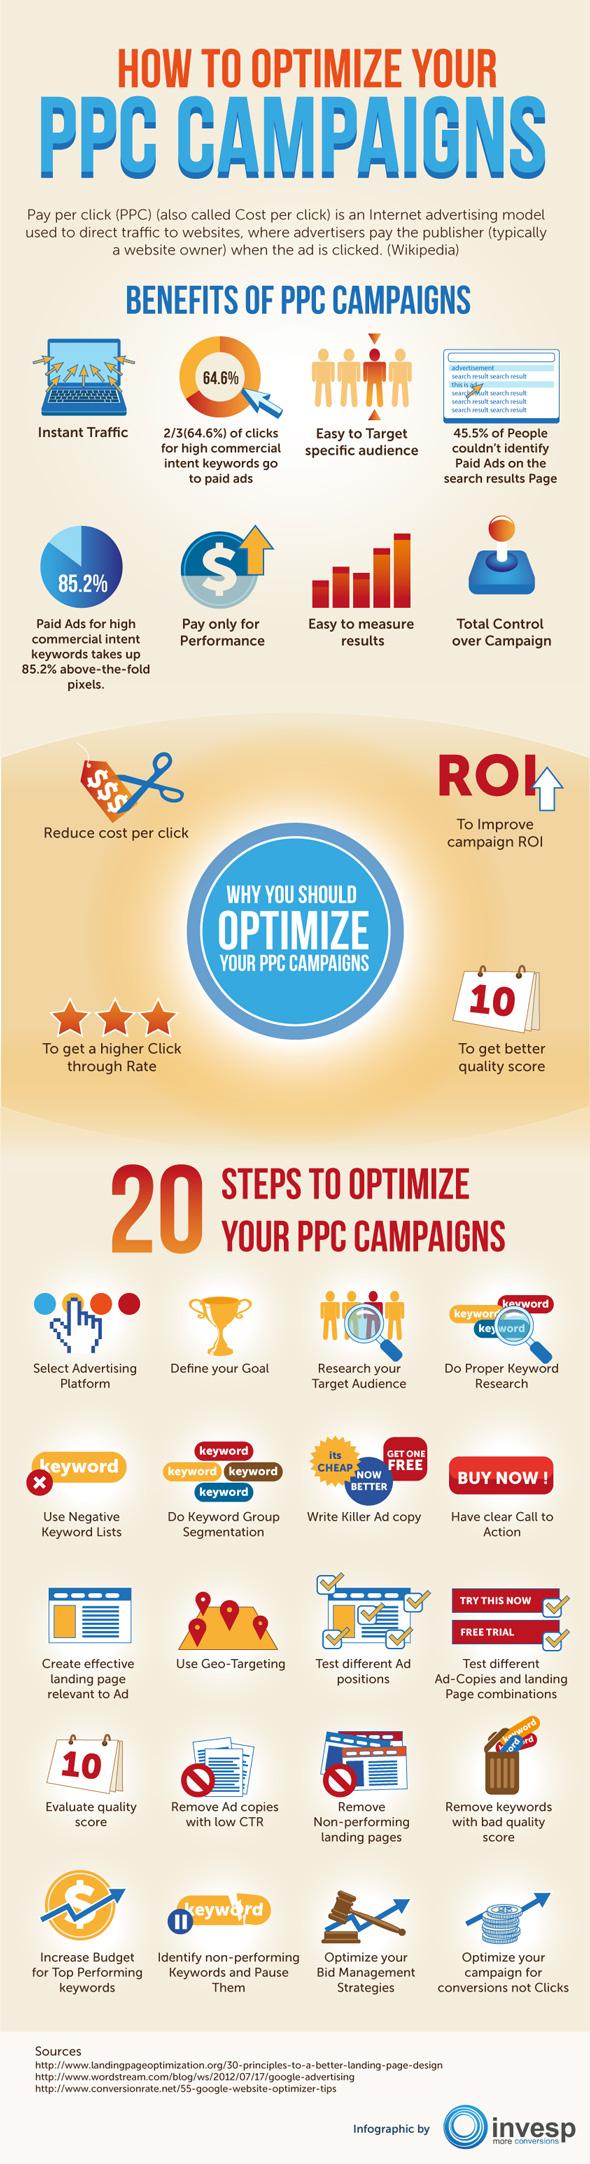 Optimize-a-PPC-Campaign